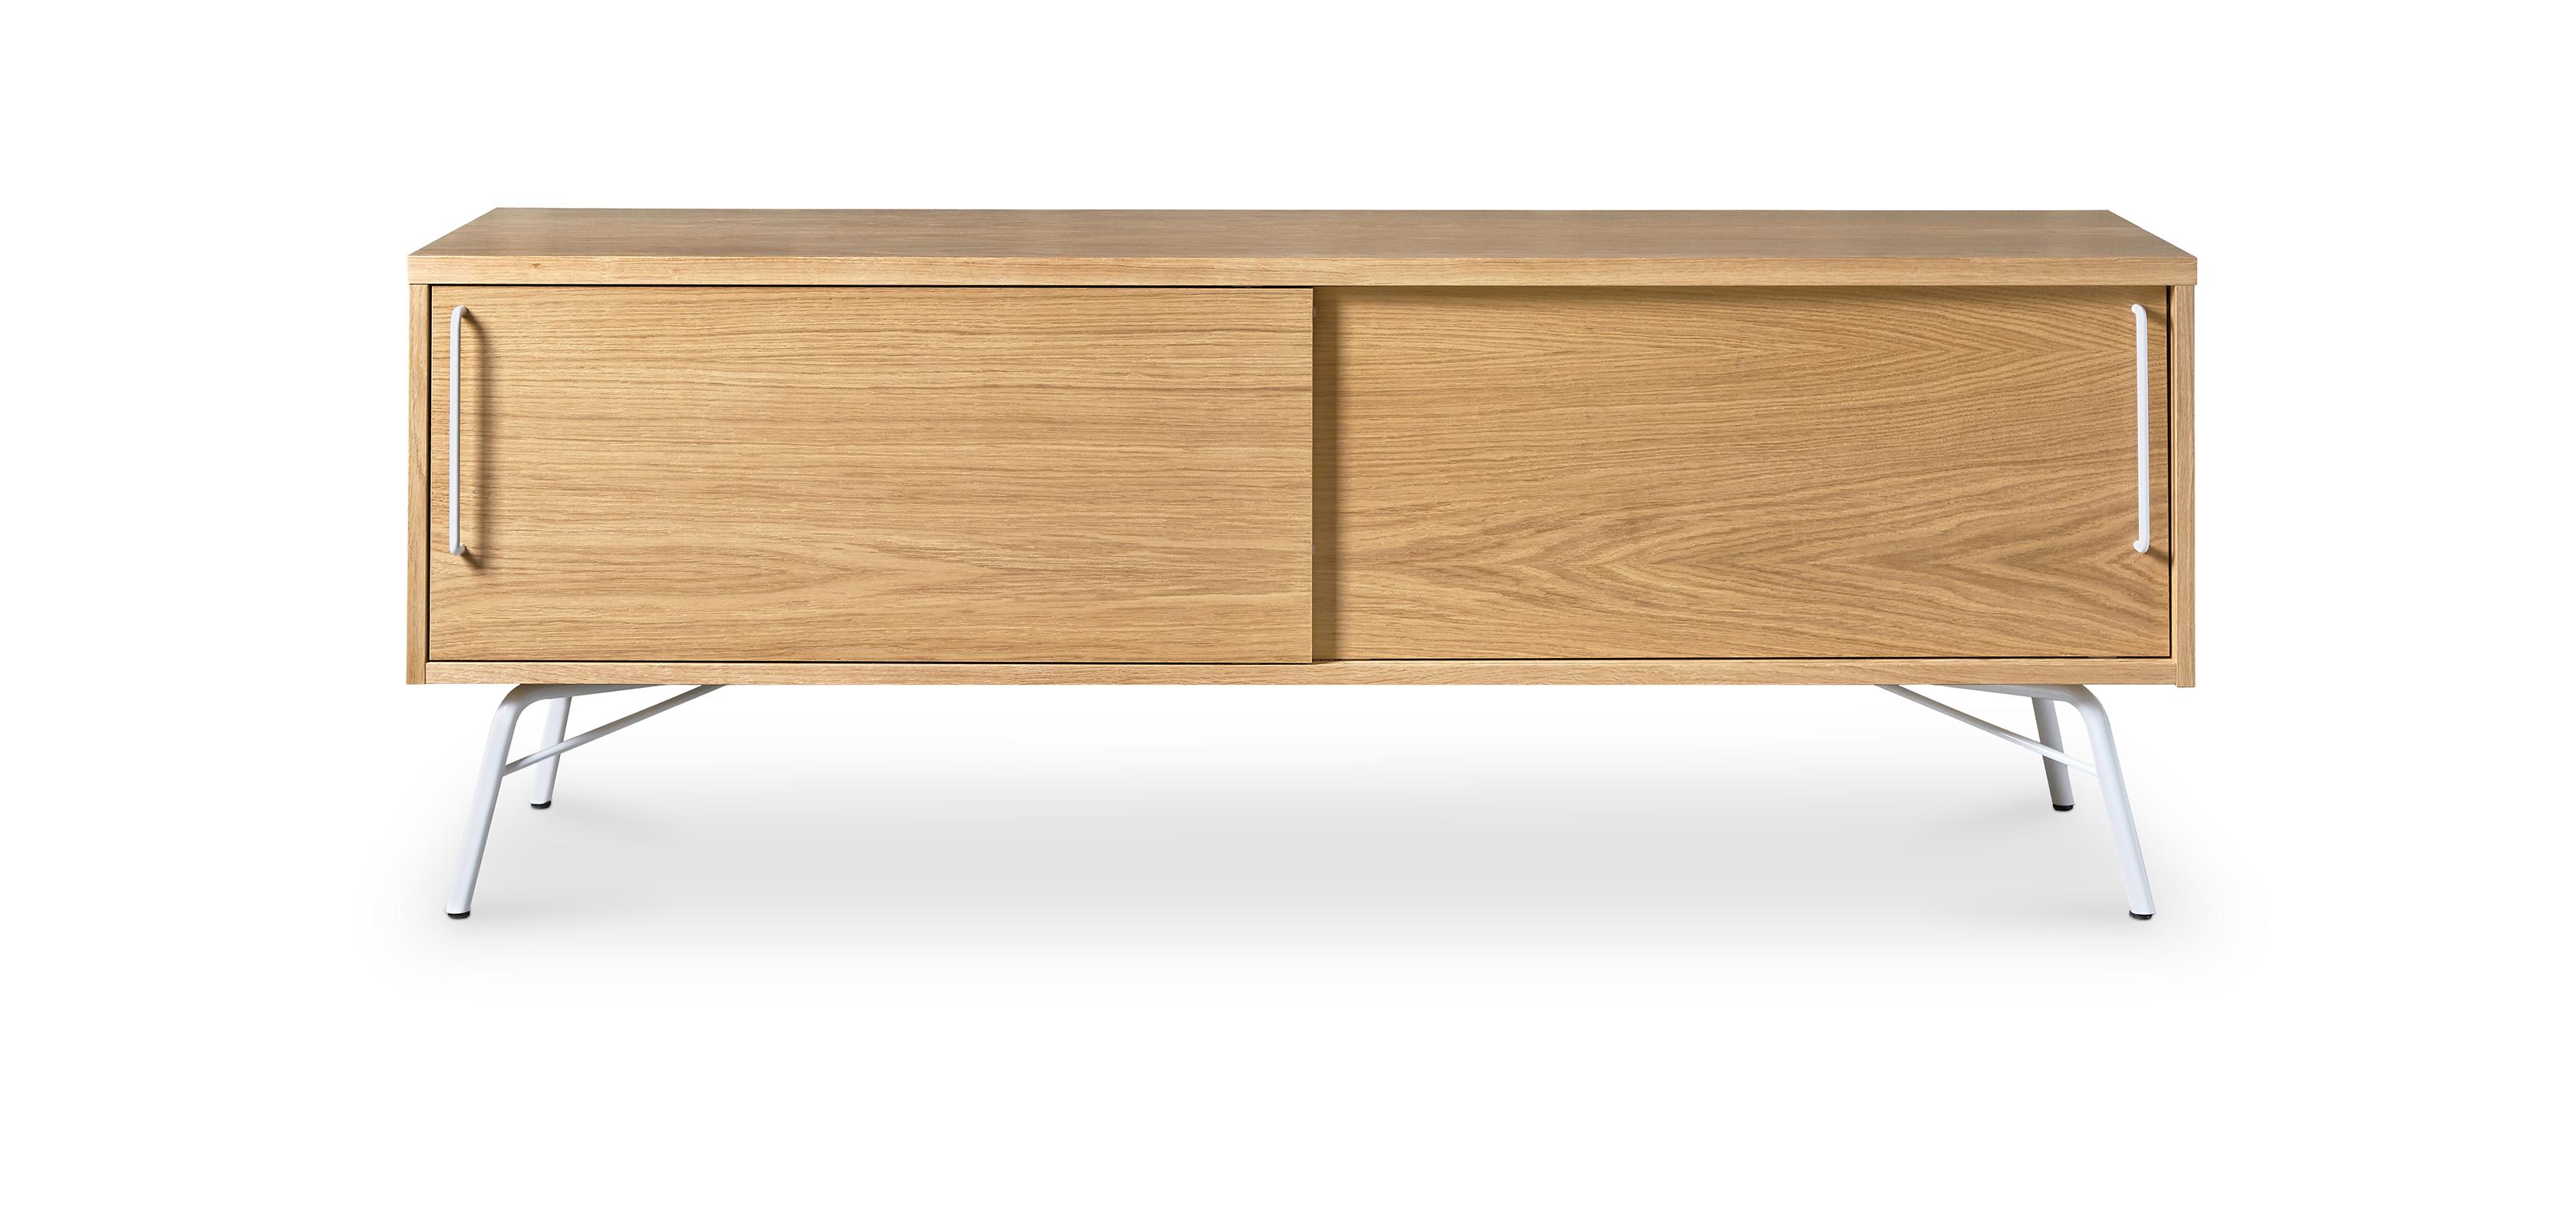 Scandinavian style natural wood Tv cabinet